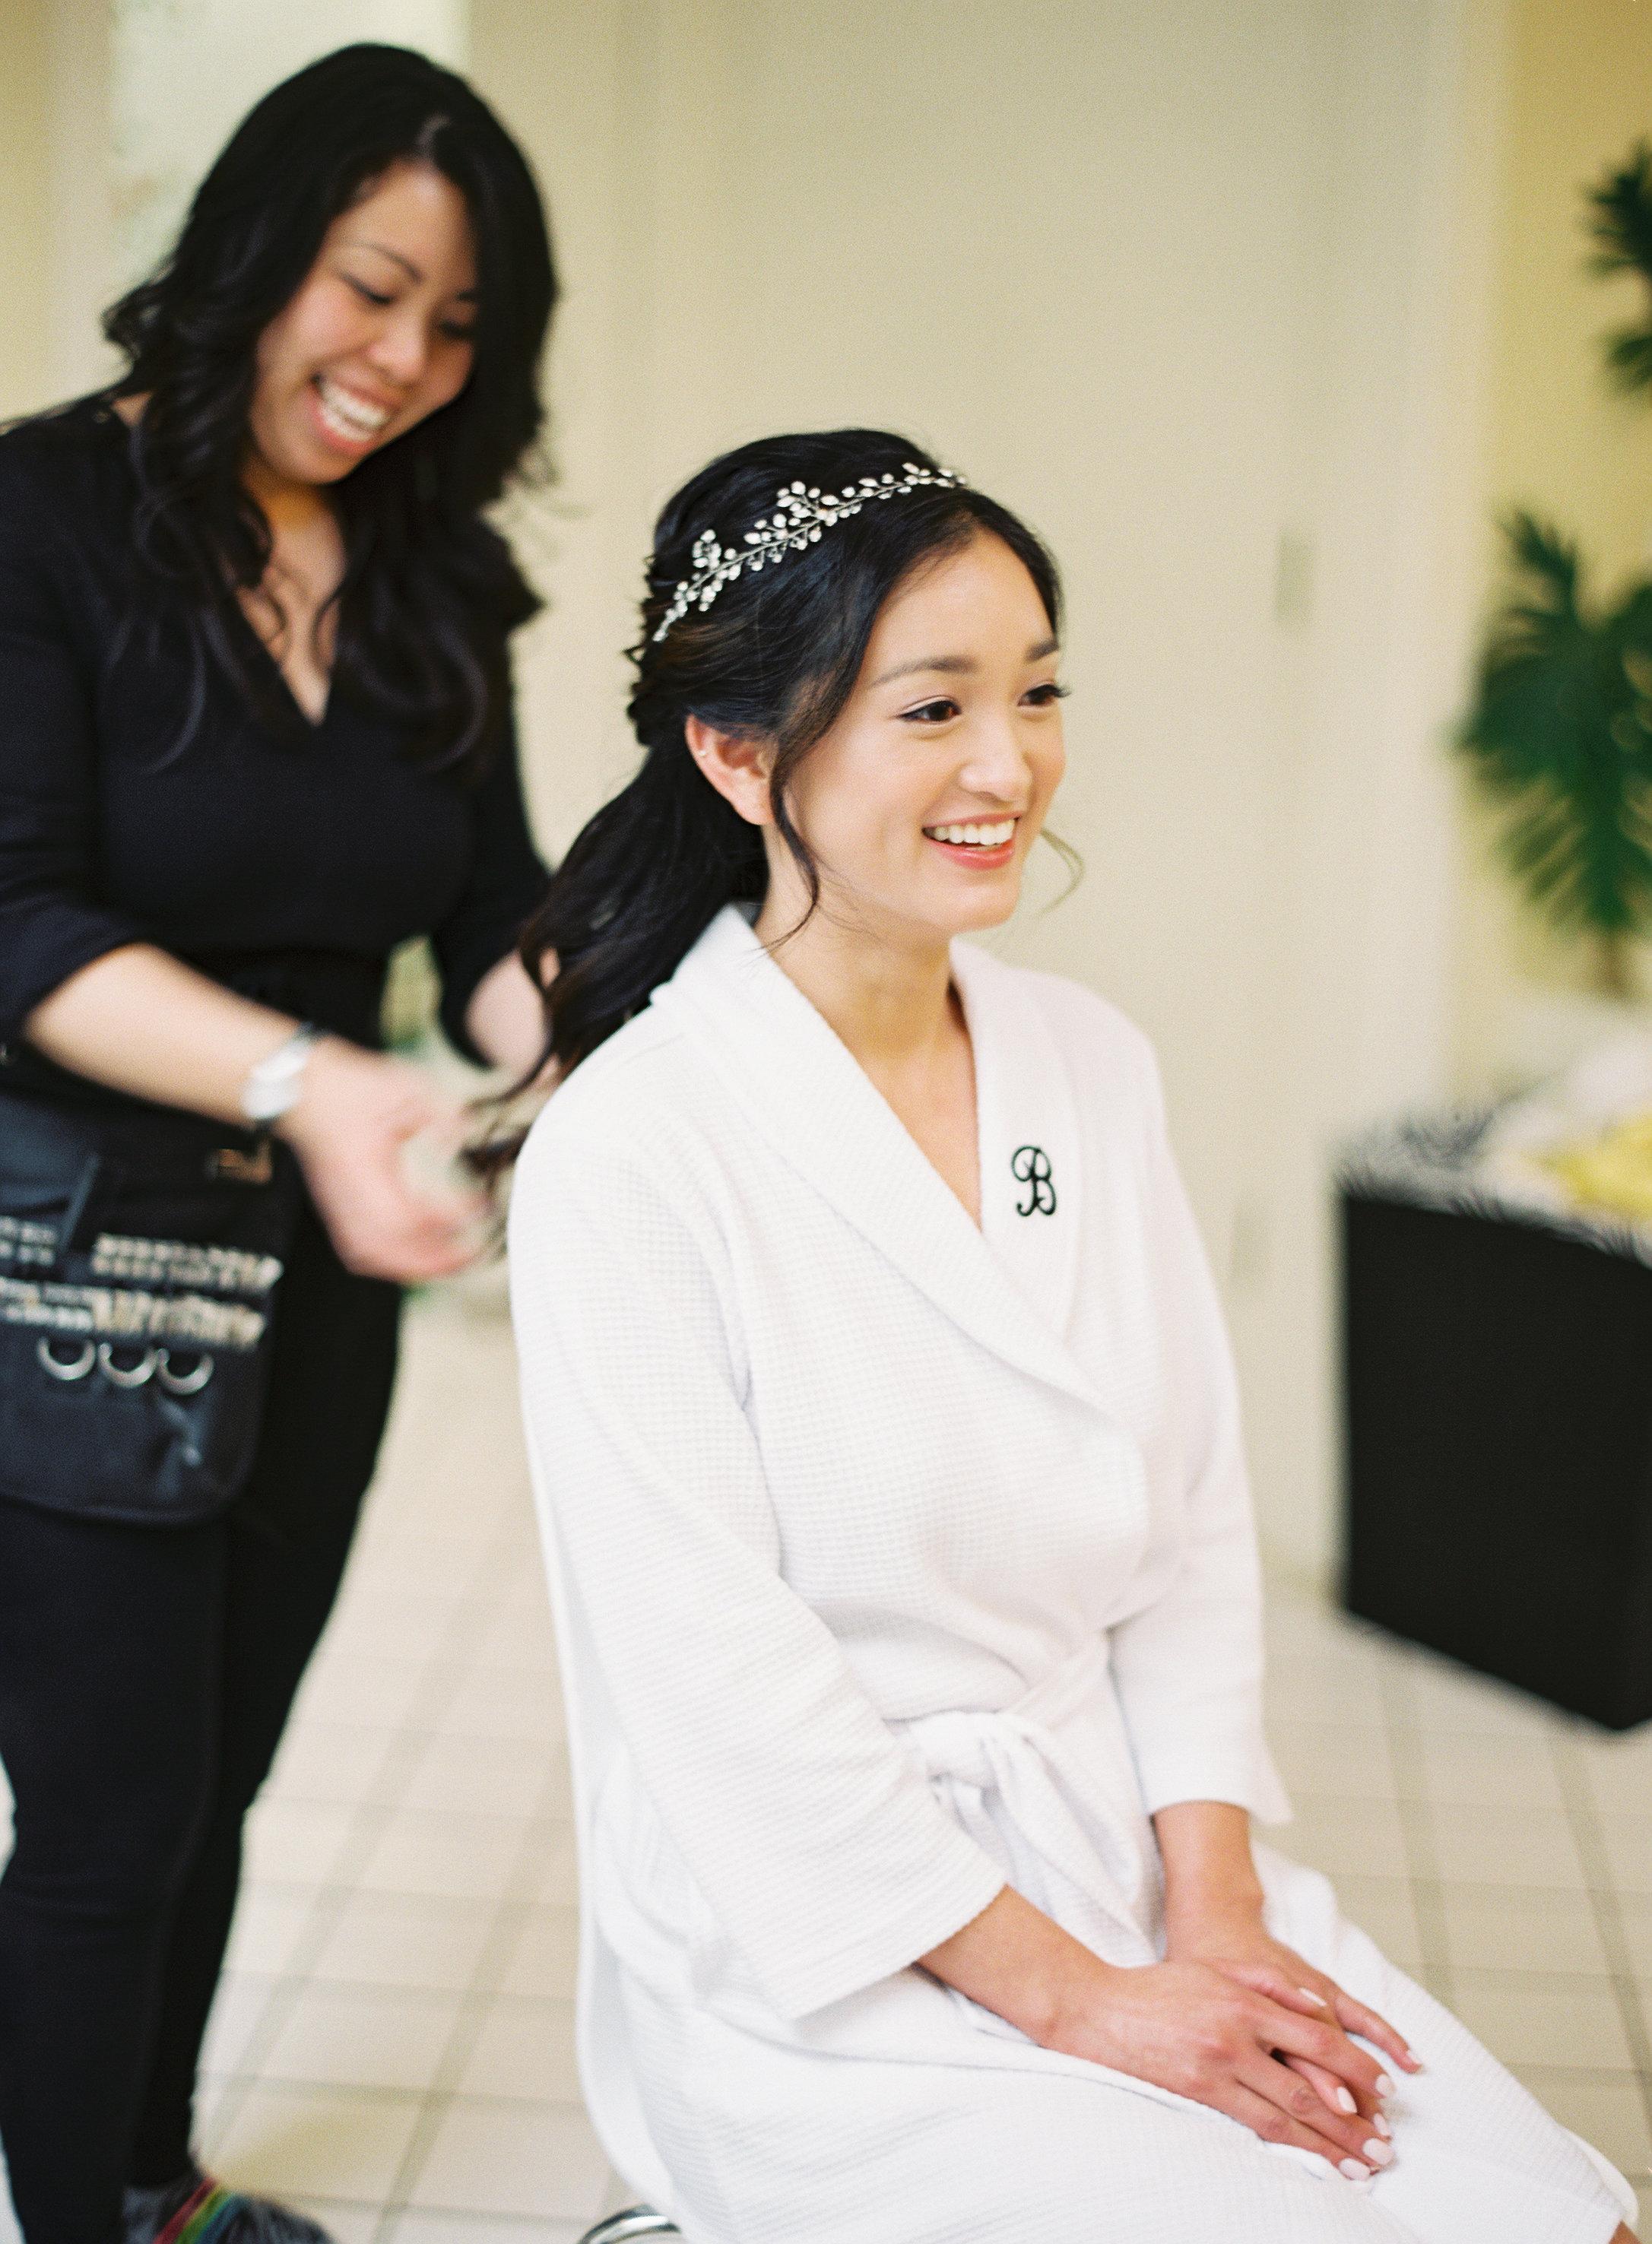 JA_Wedding_Getting_Ready_037.jpg